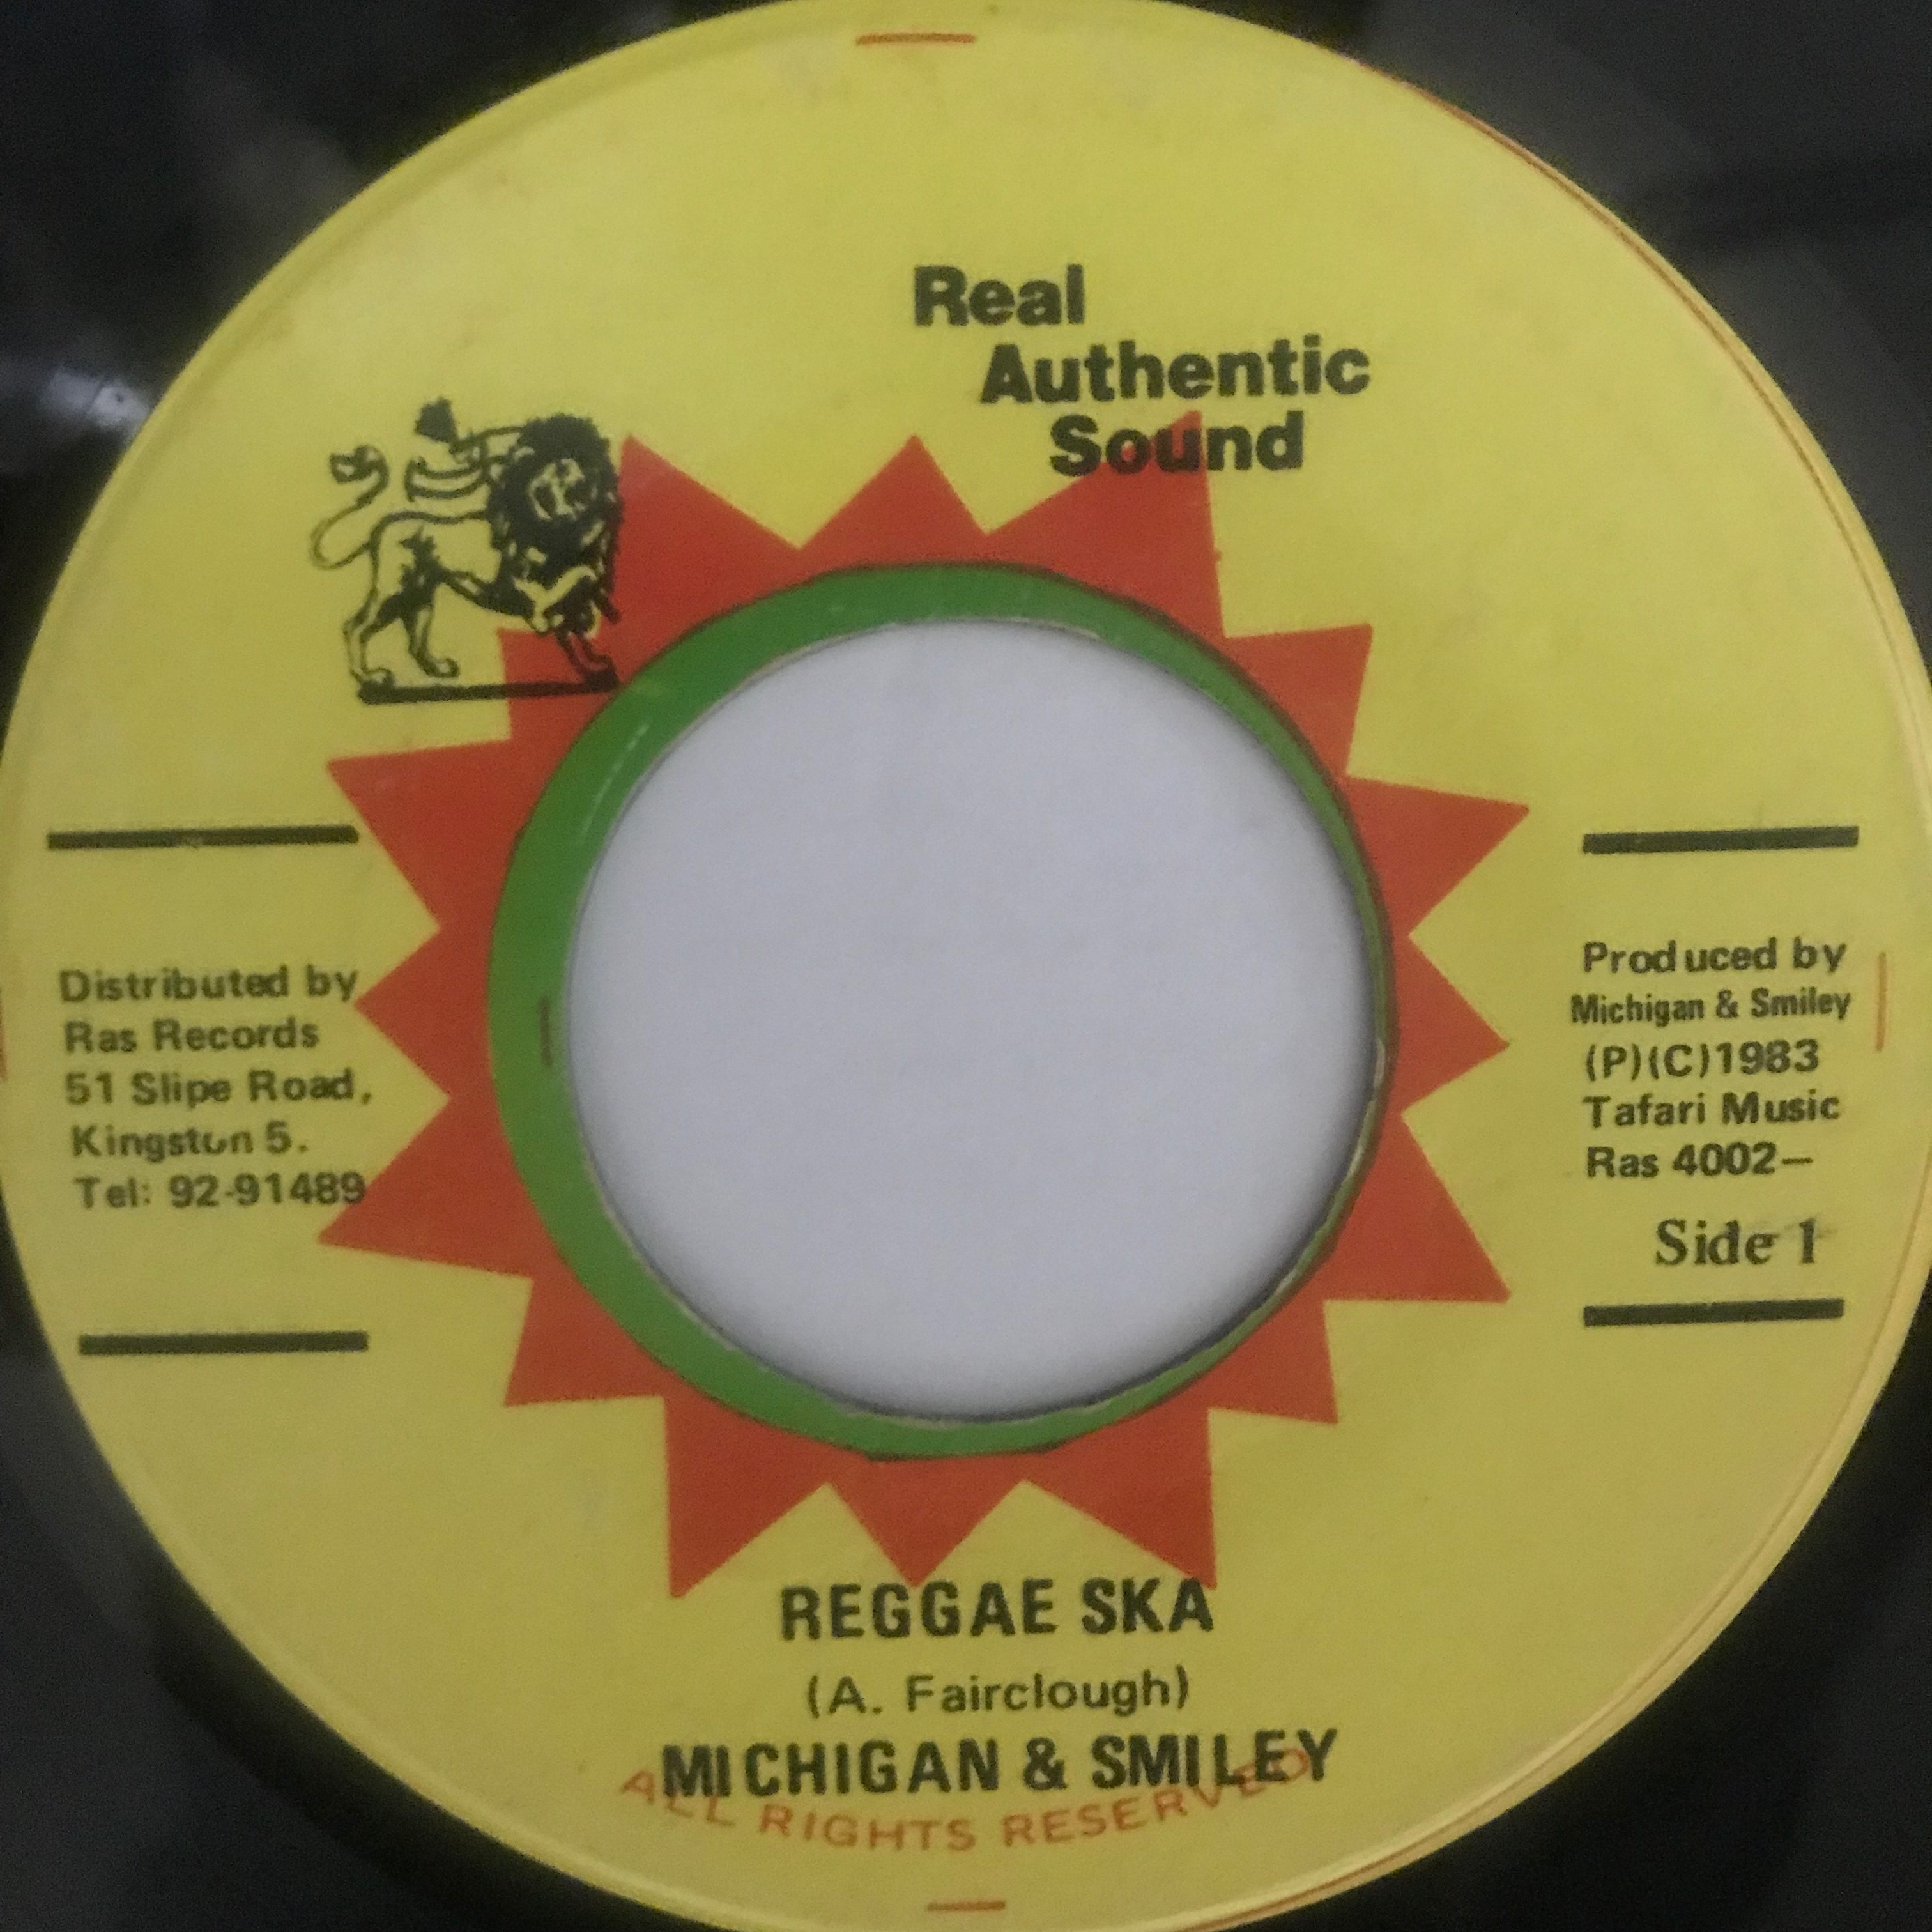 Michigan & Smiley - Reggae Ska【7-10775】